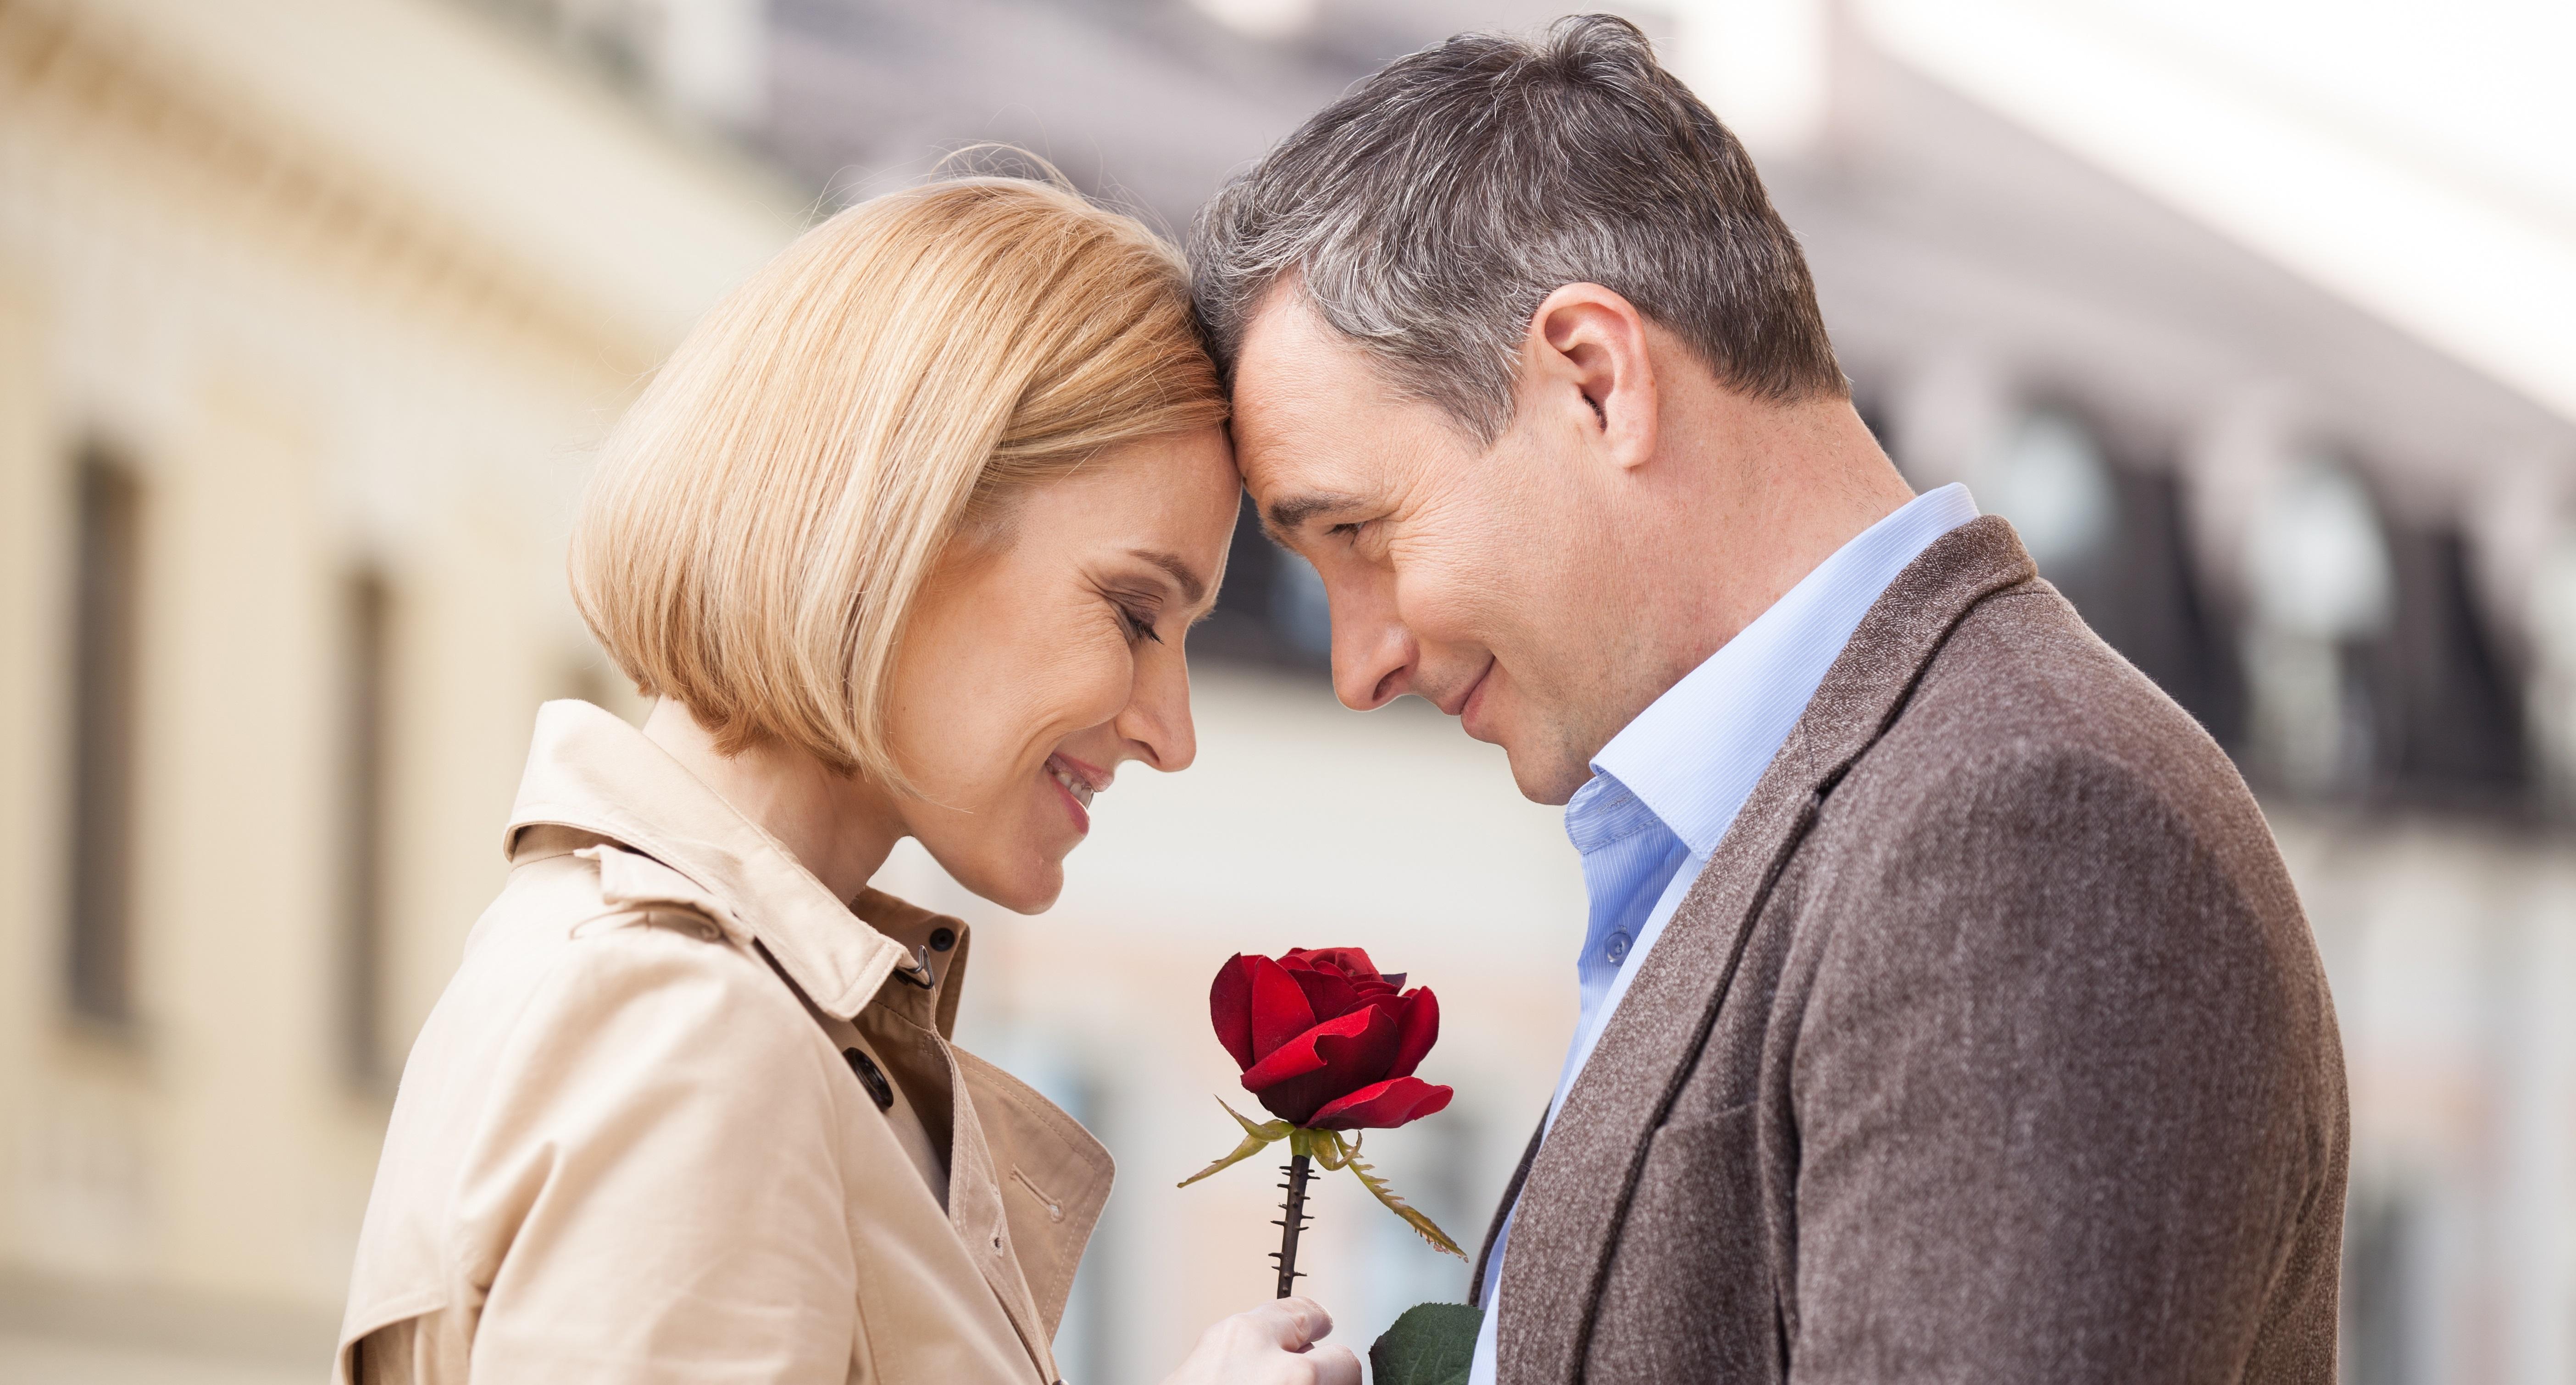 Doamne cauta barbati pentru casatorie bosilegrad intalniri fete singure din costesti